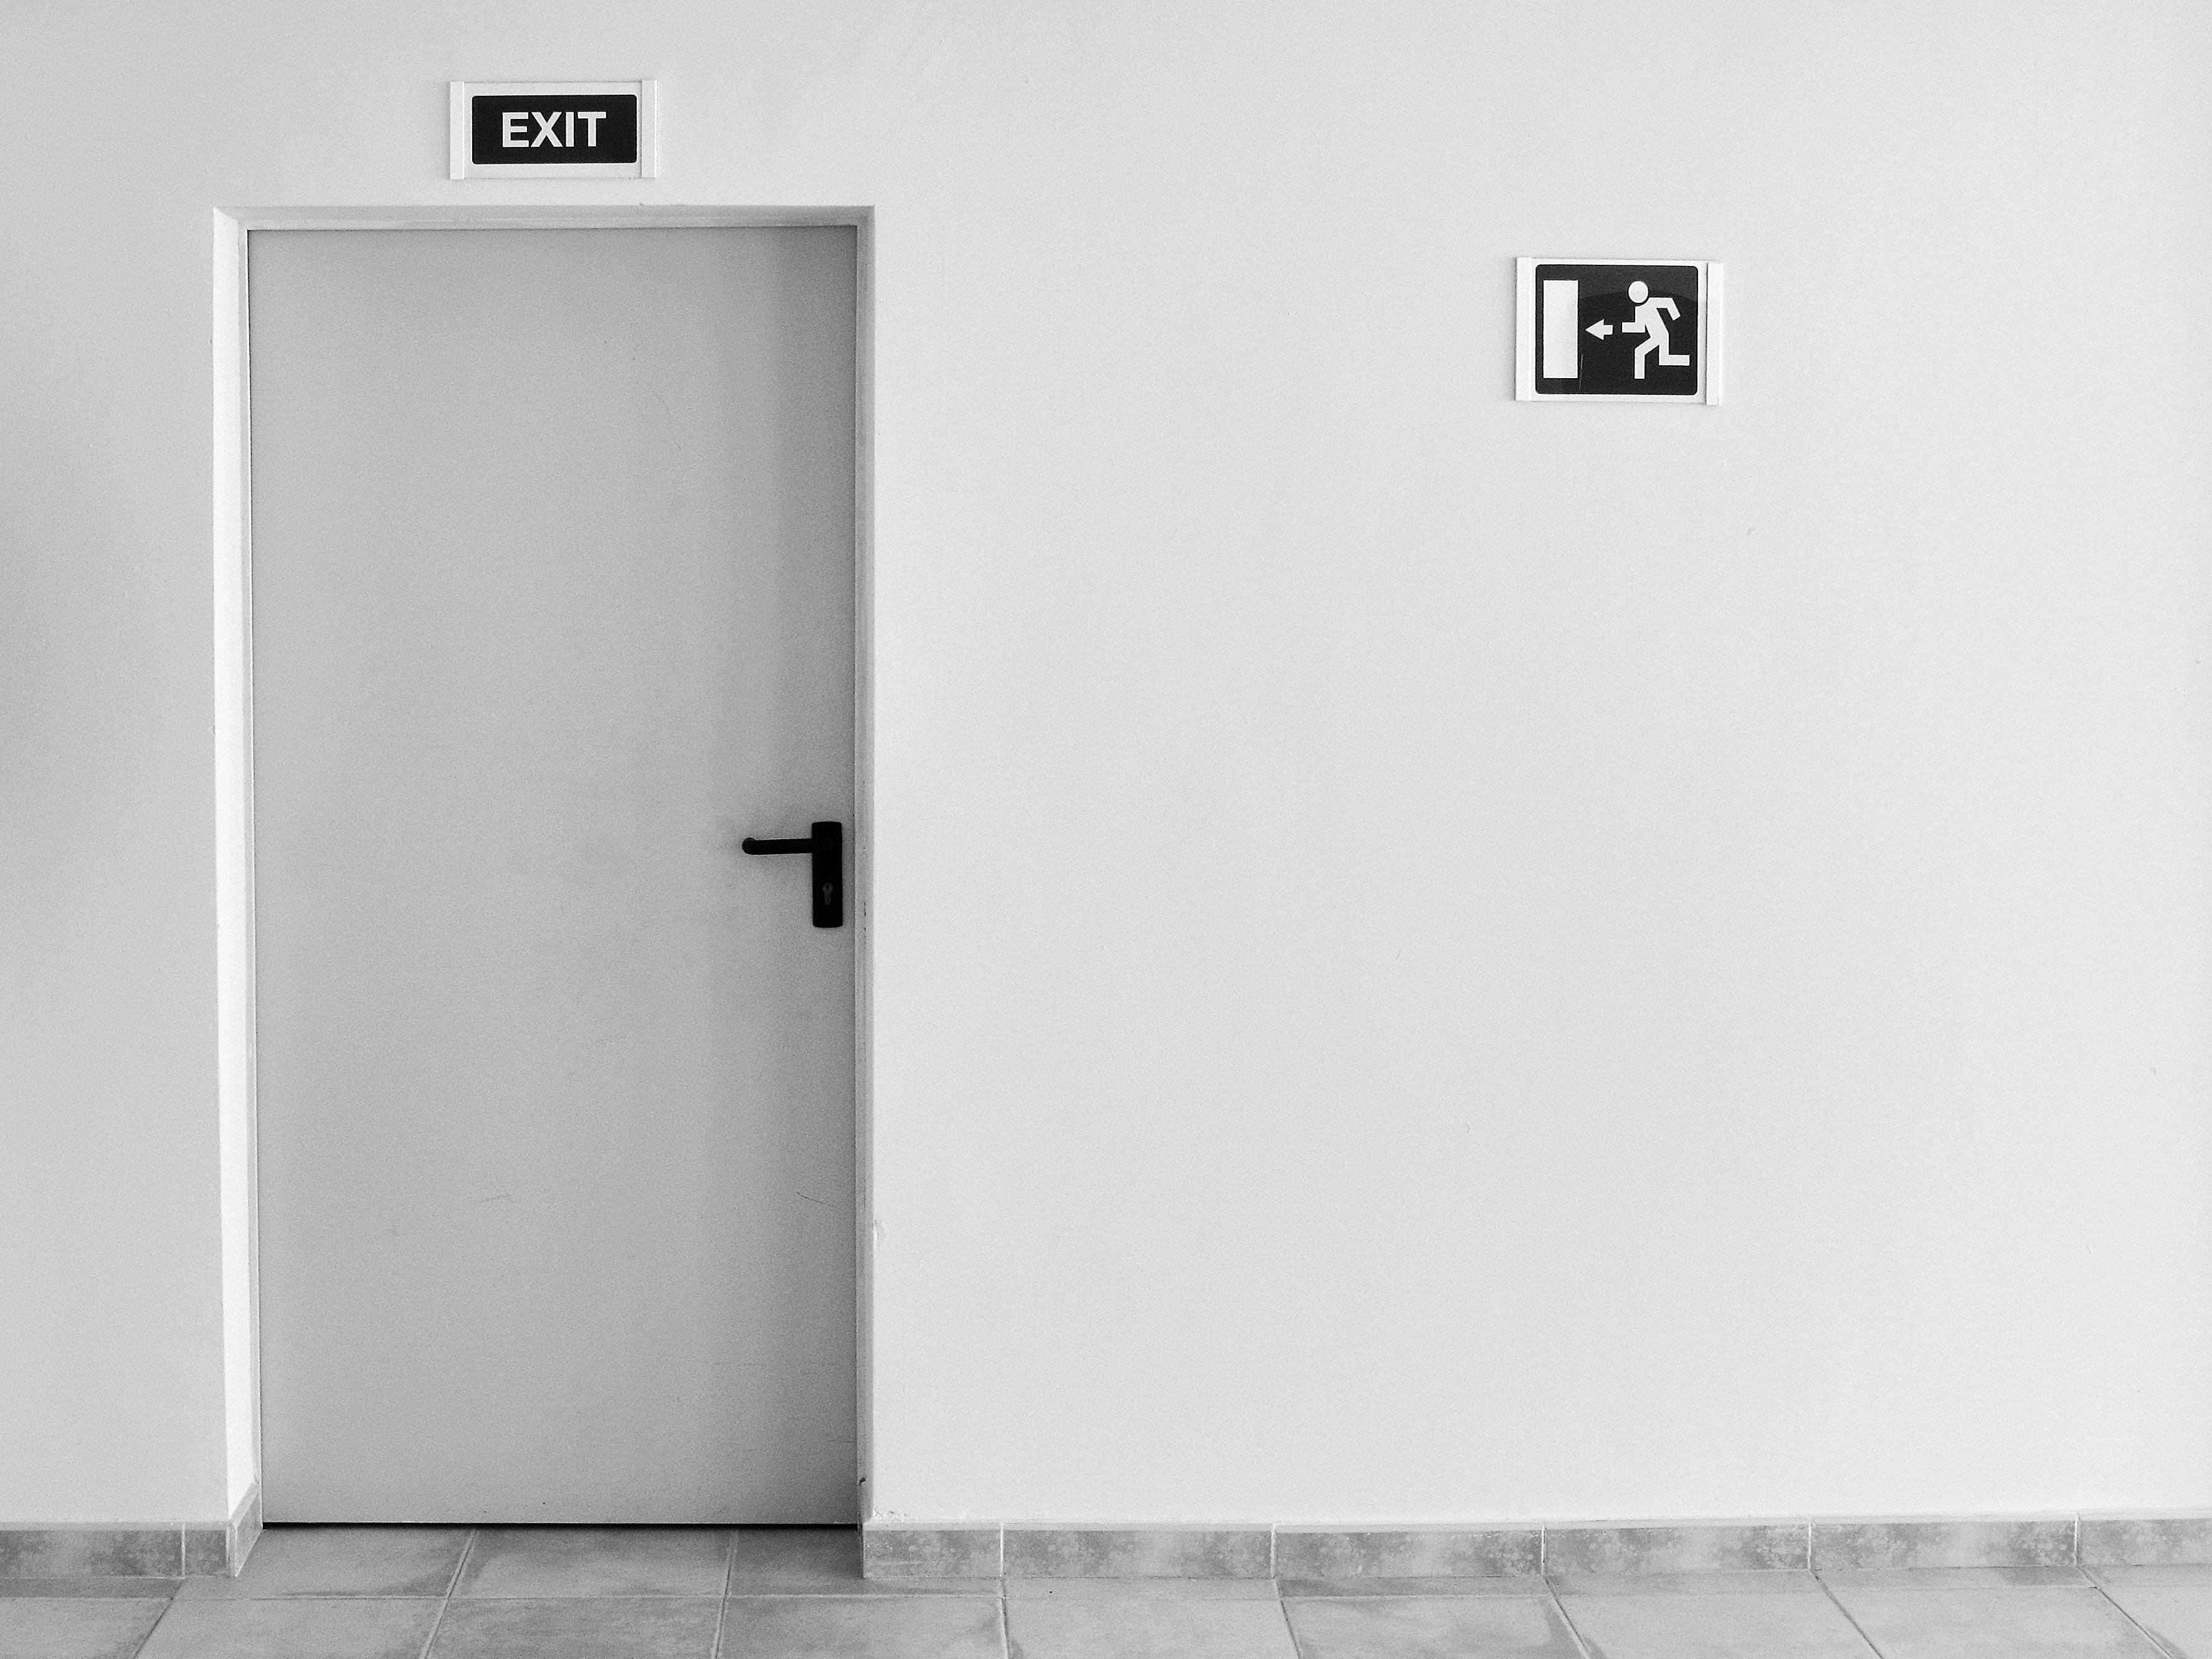 4 ways to facilitate graceful employee departures